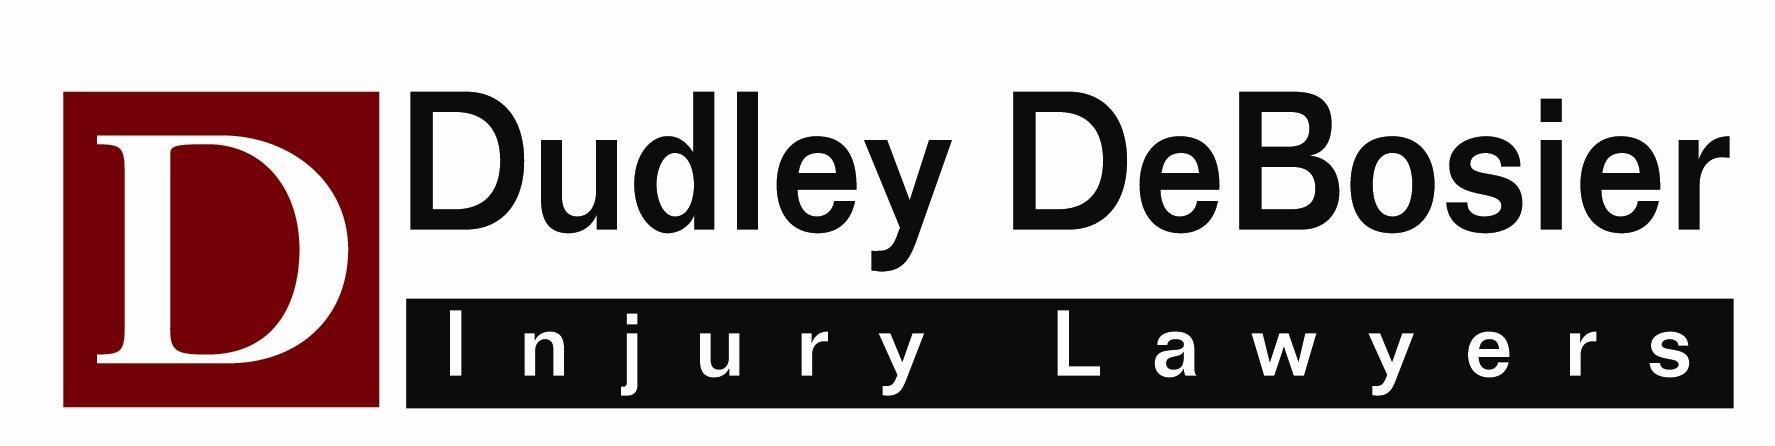 Dudley DeBosier Injury Lawyers